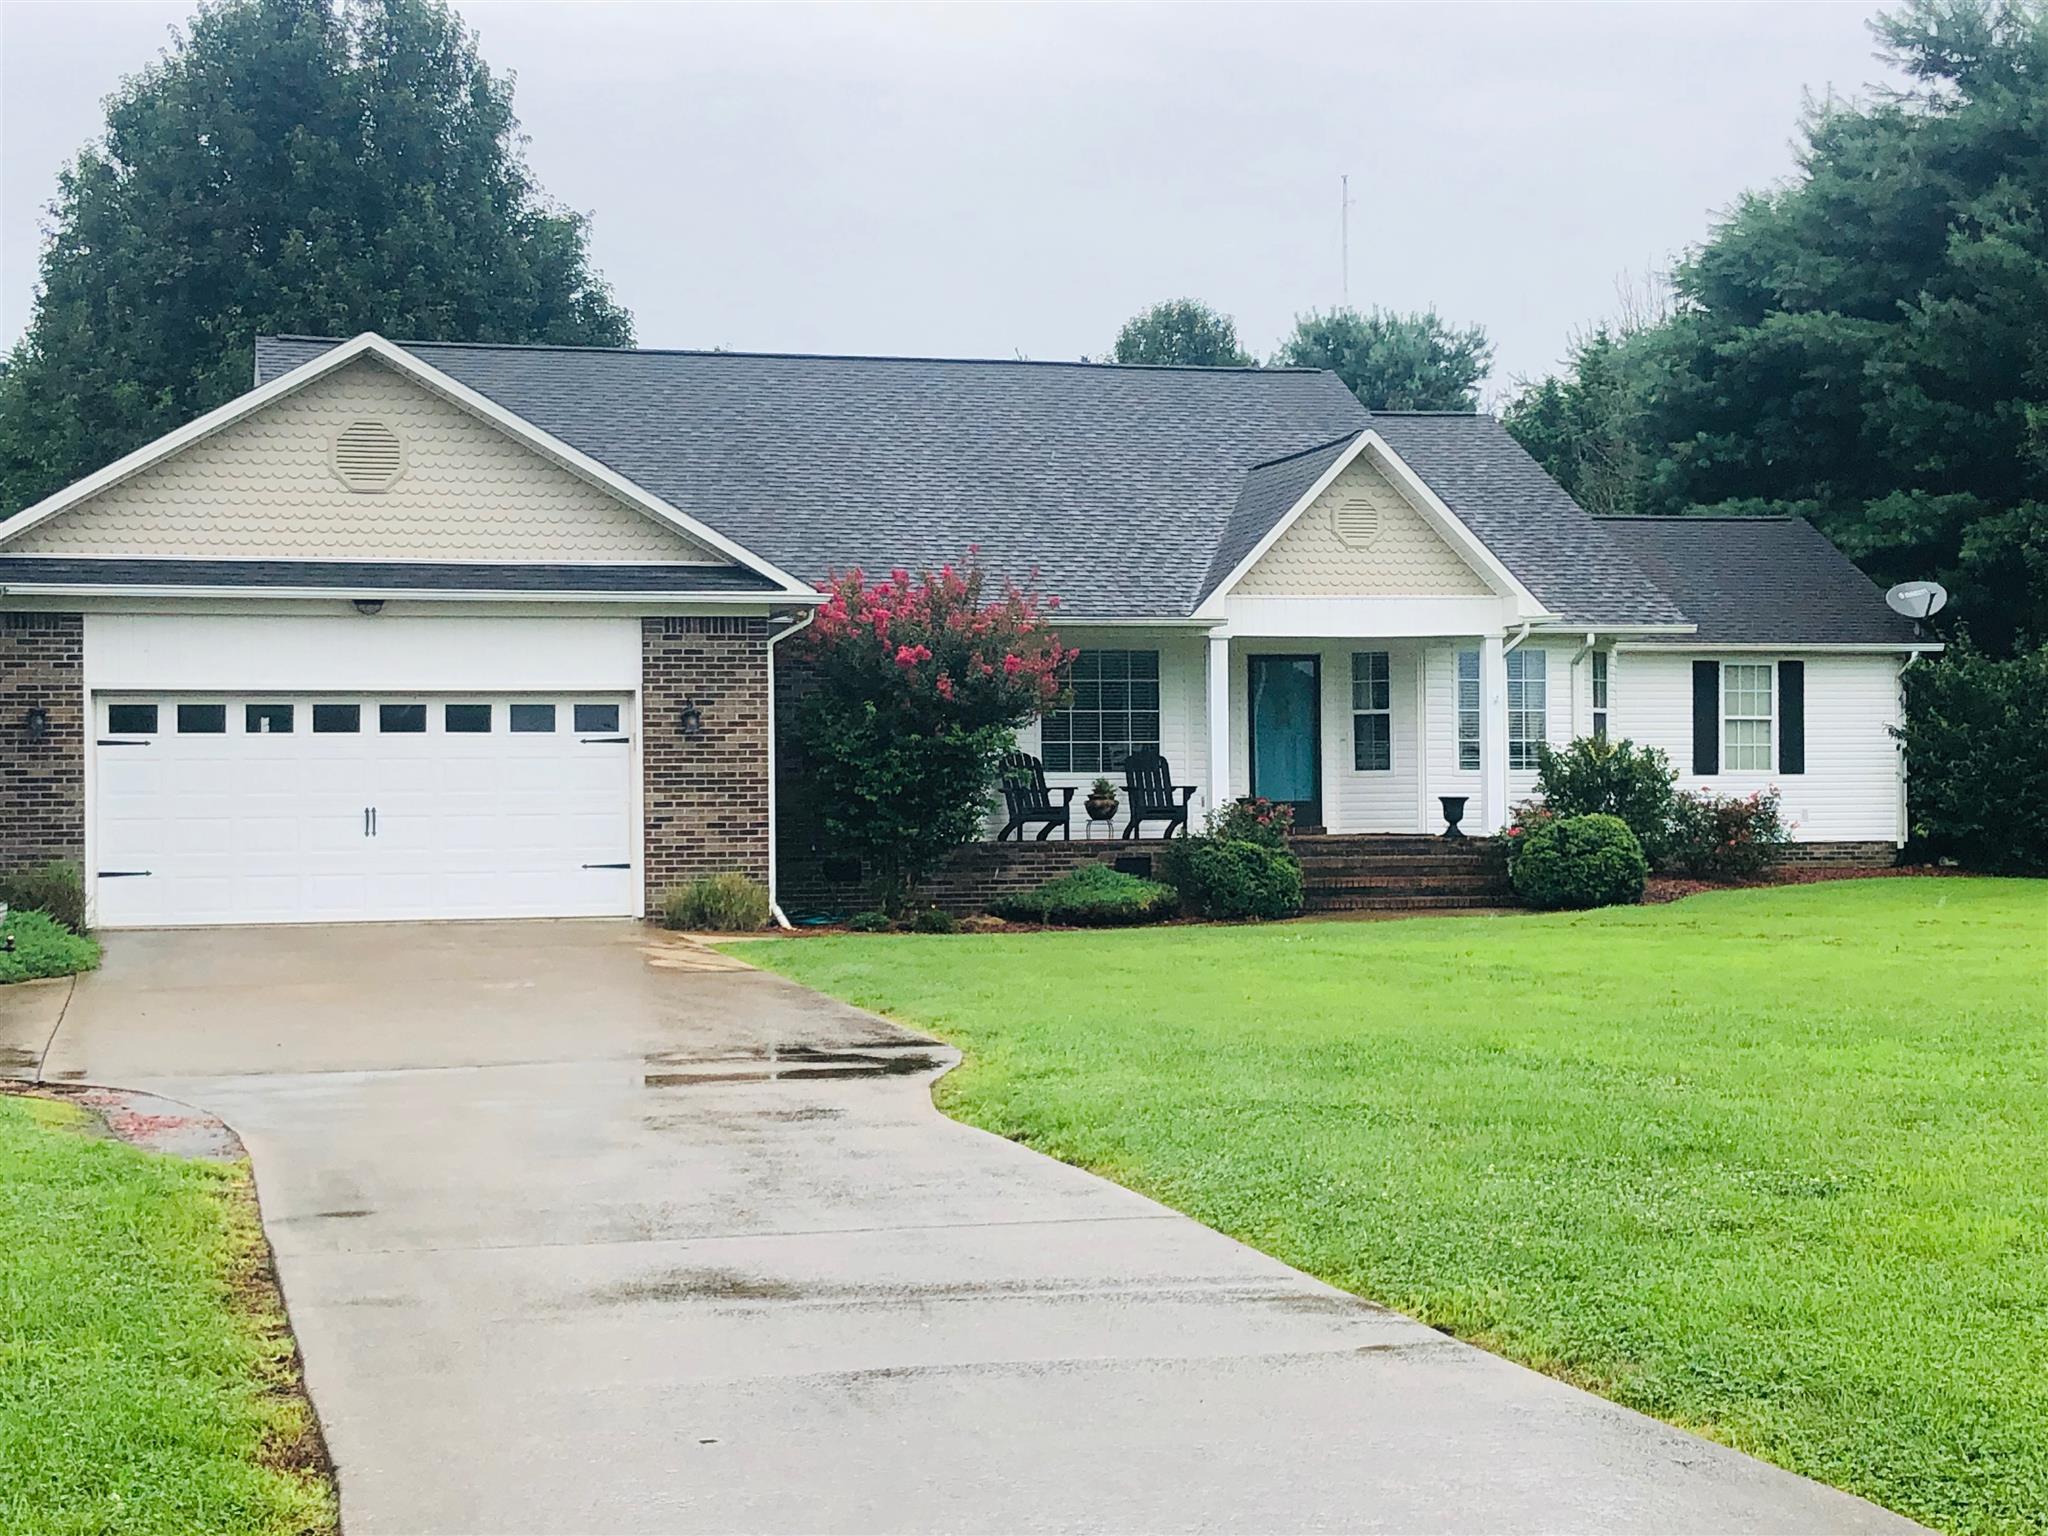 20 Beuerlein Cir, Lawrenceburg, TN 38464 - Lawrenceburg, TN real estate listing